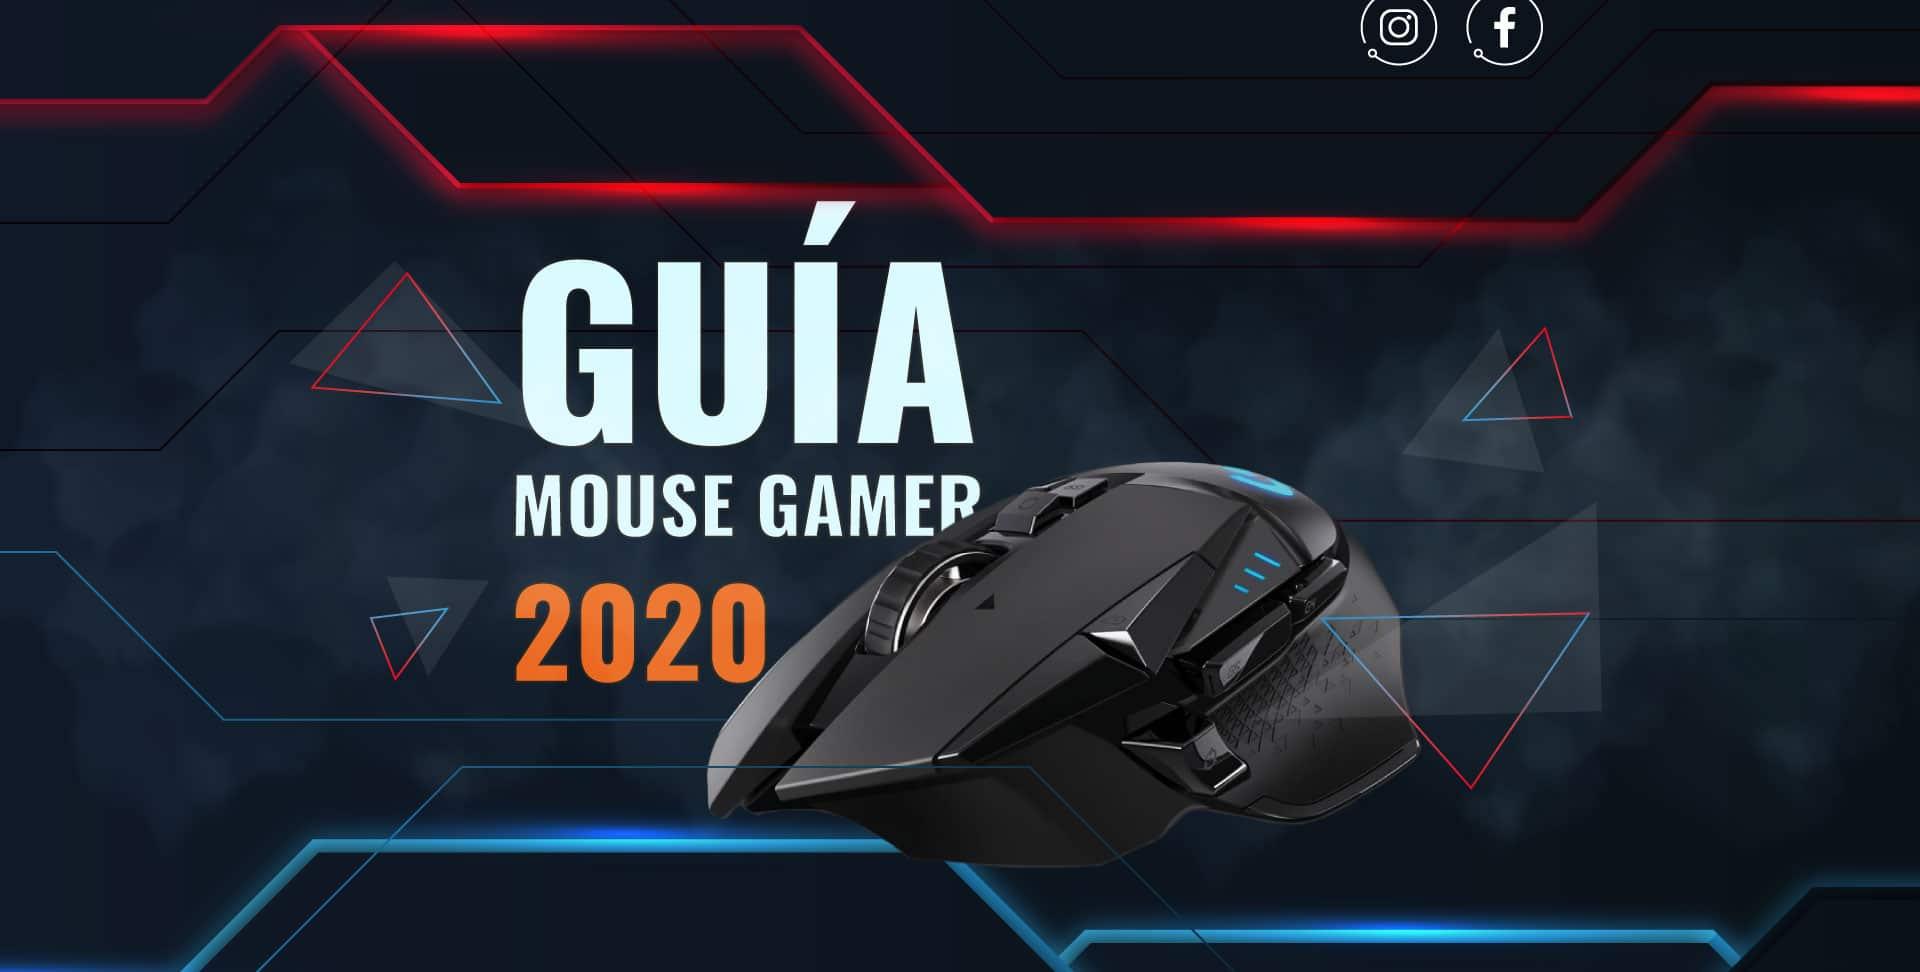 guia completa mouse gamer 2020